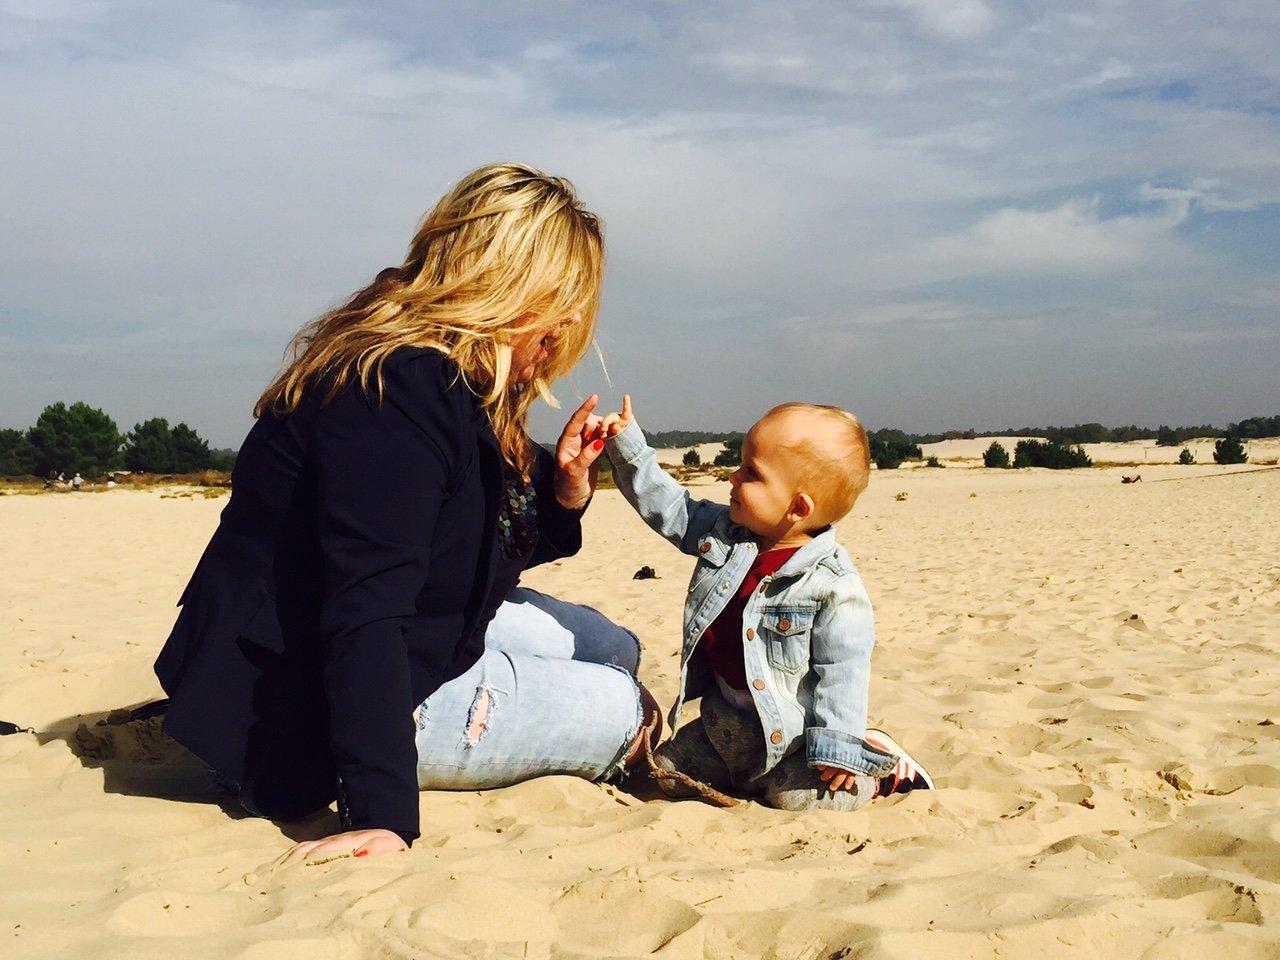 Spelen met mama Loonse en Drunense duinen Lifestyleblog Foodinista